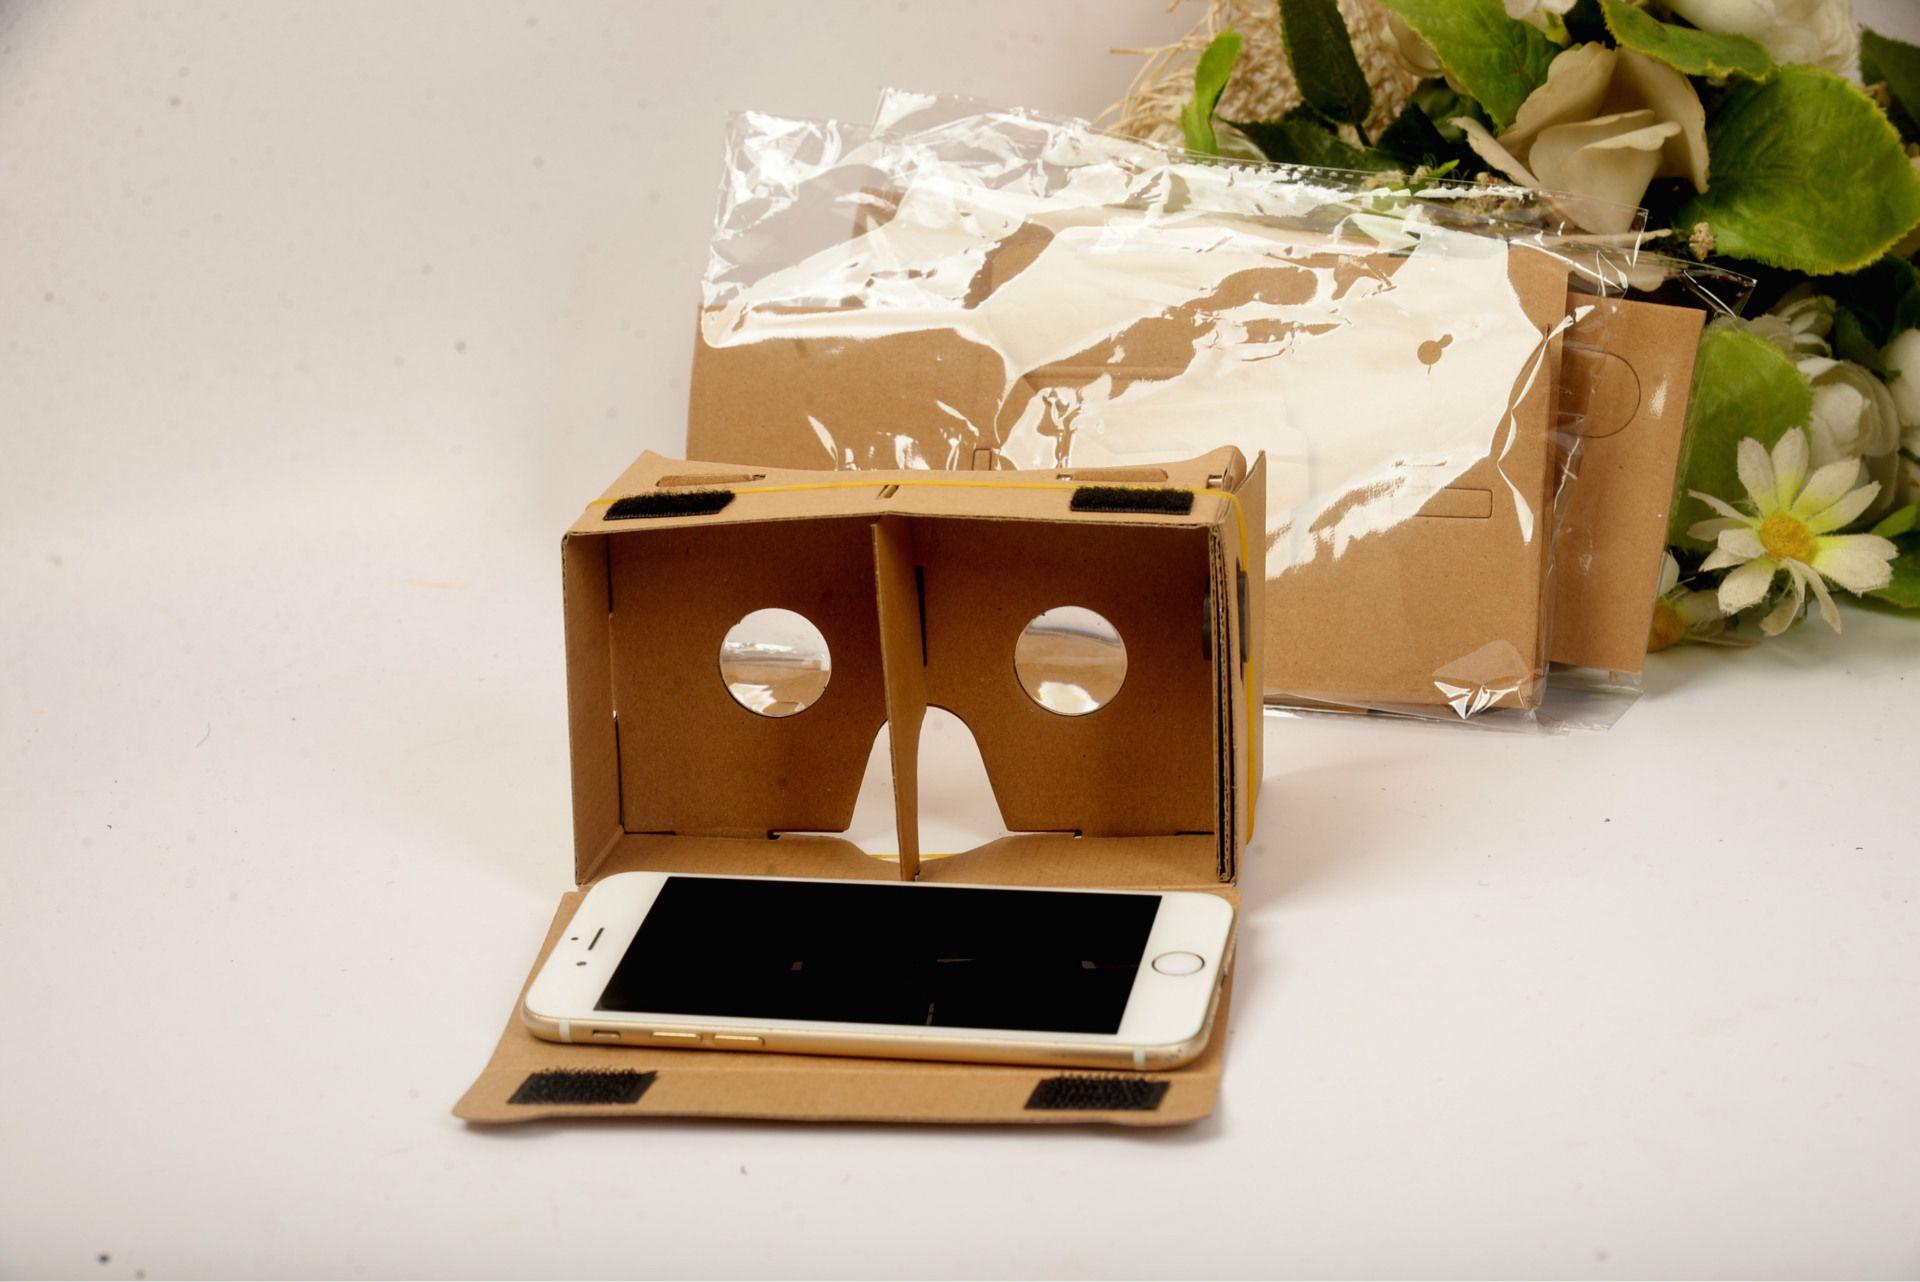 50PCS Gafas 3D VR Gafas DIY Google Cardboard Teléfono móvil Realidad virtual Cartón no oficial VR Toolkit Gafas 3D CCA1785 B-XY